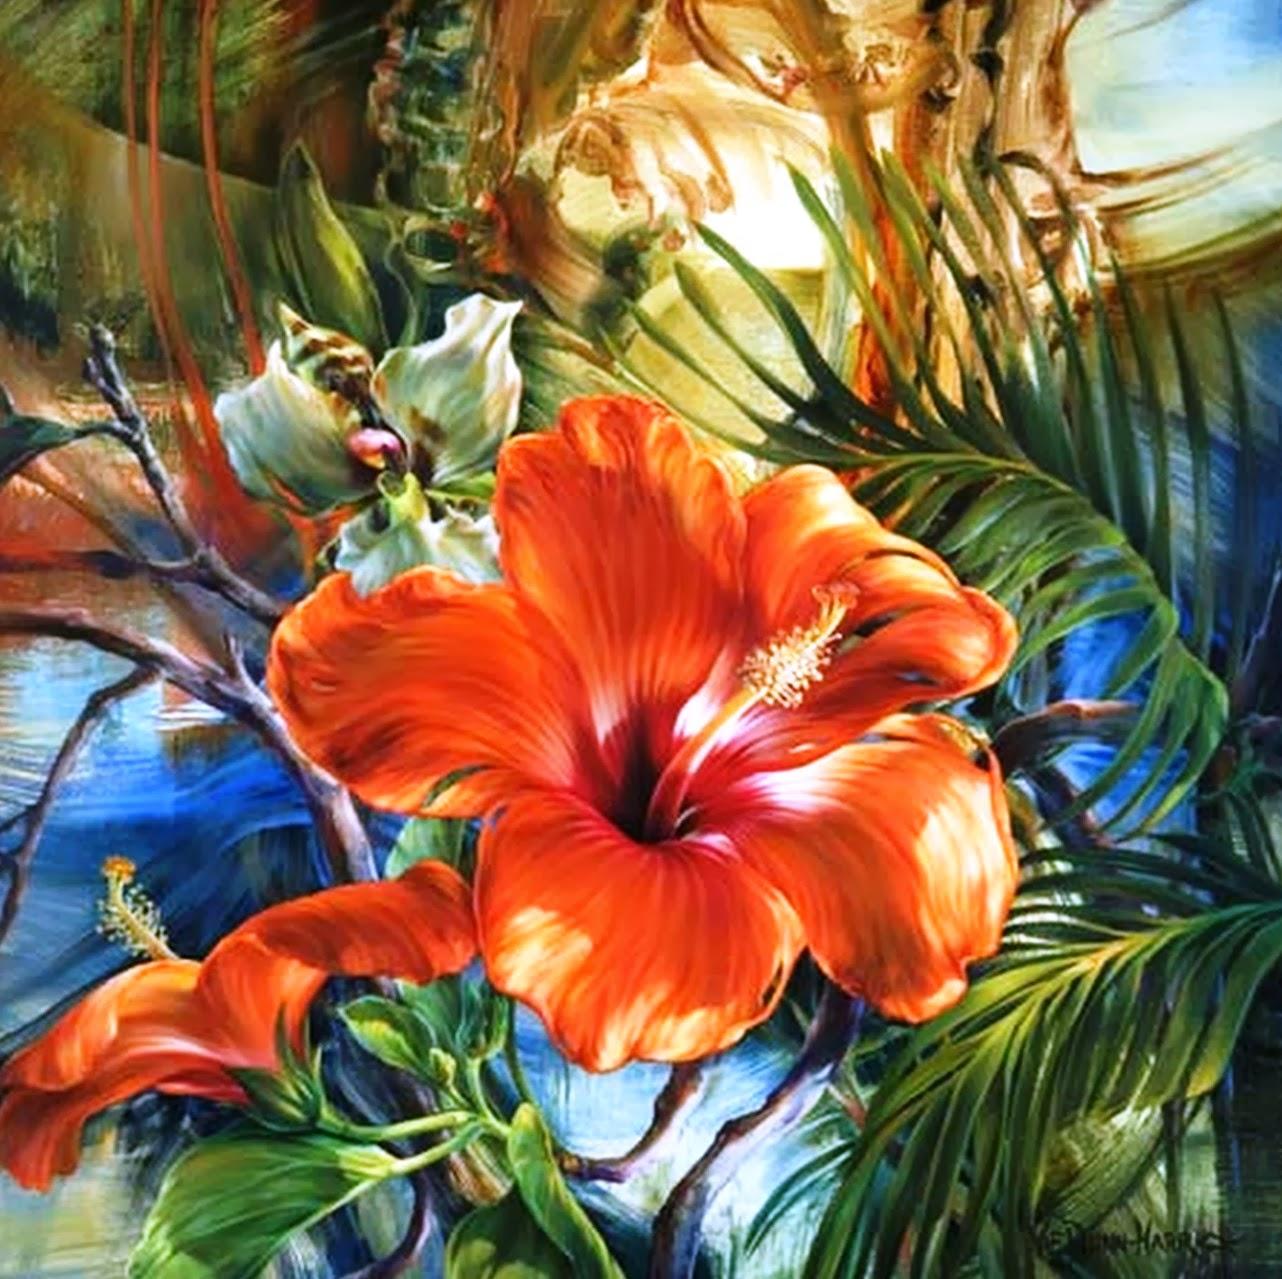 Pintura moderna y fotograf a art stica pinturas modernas - Cuadros flores modernas ...